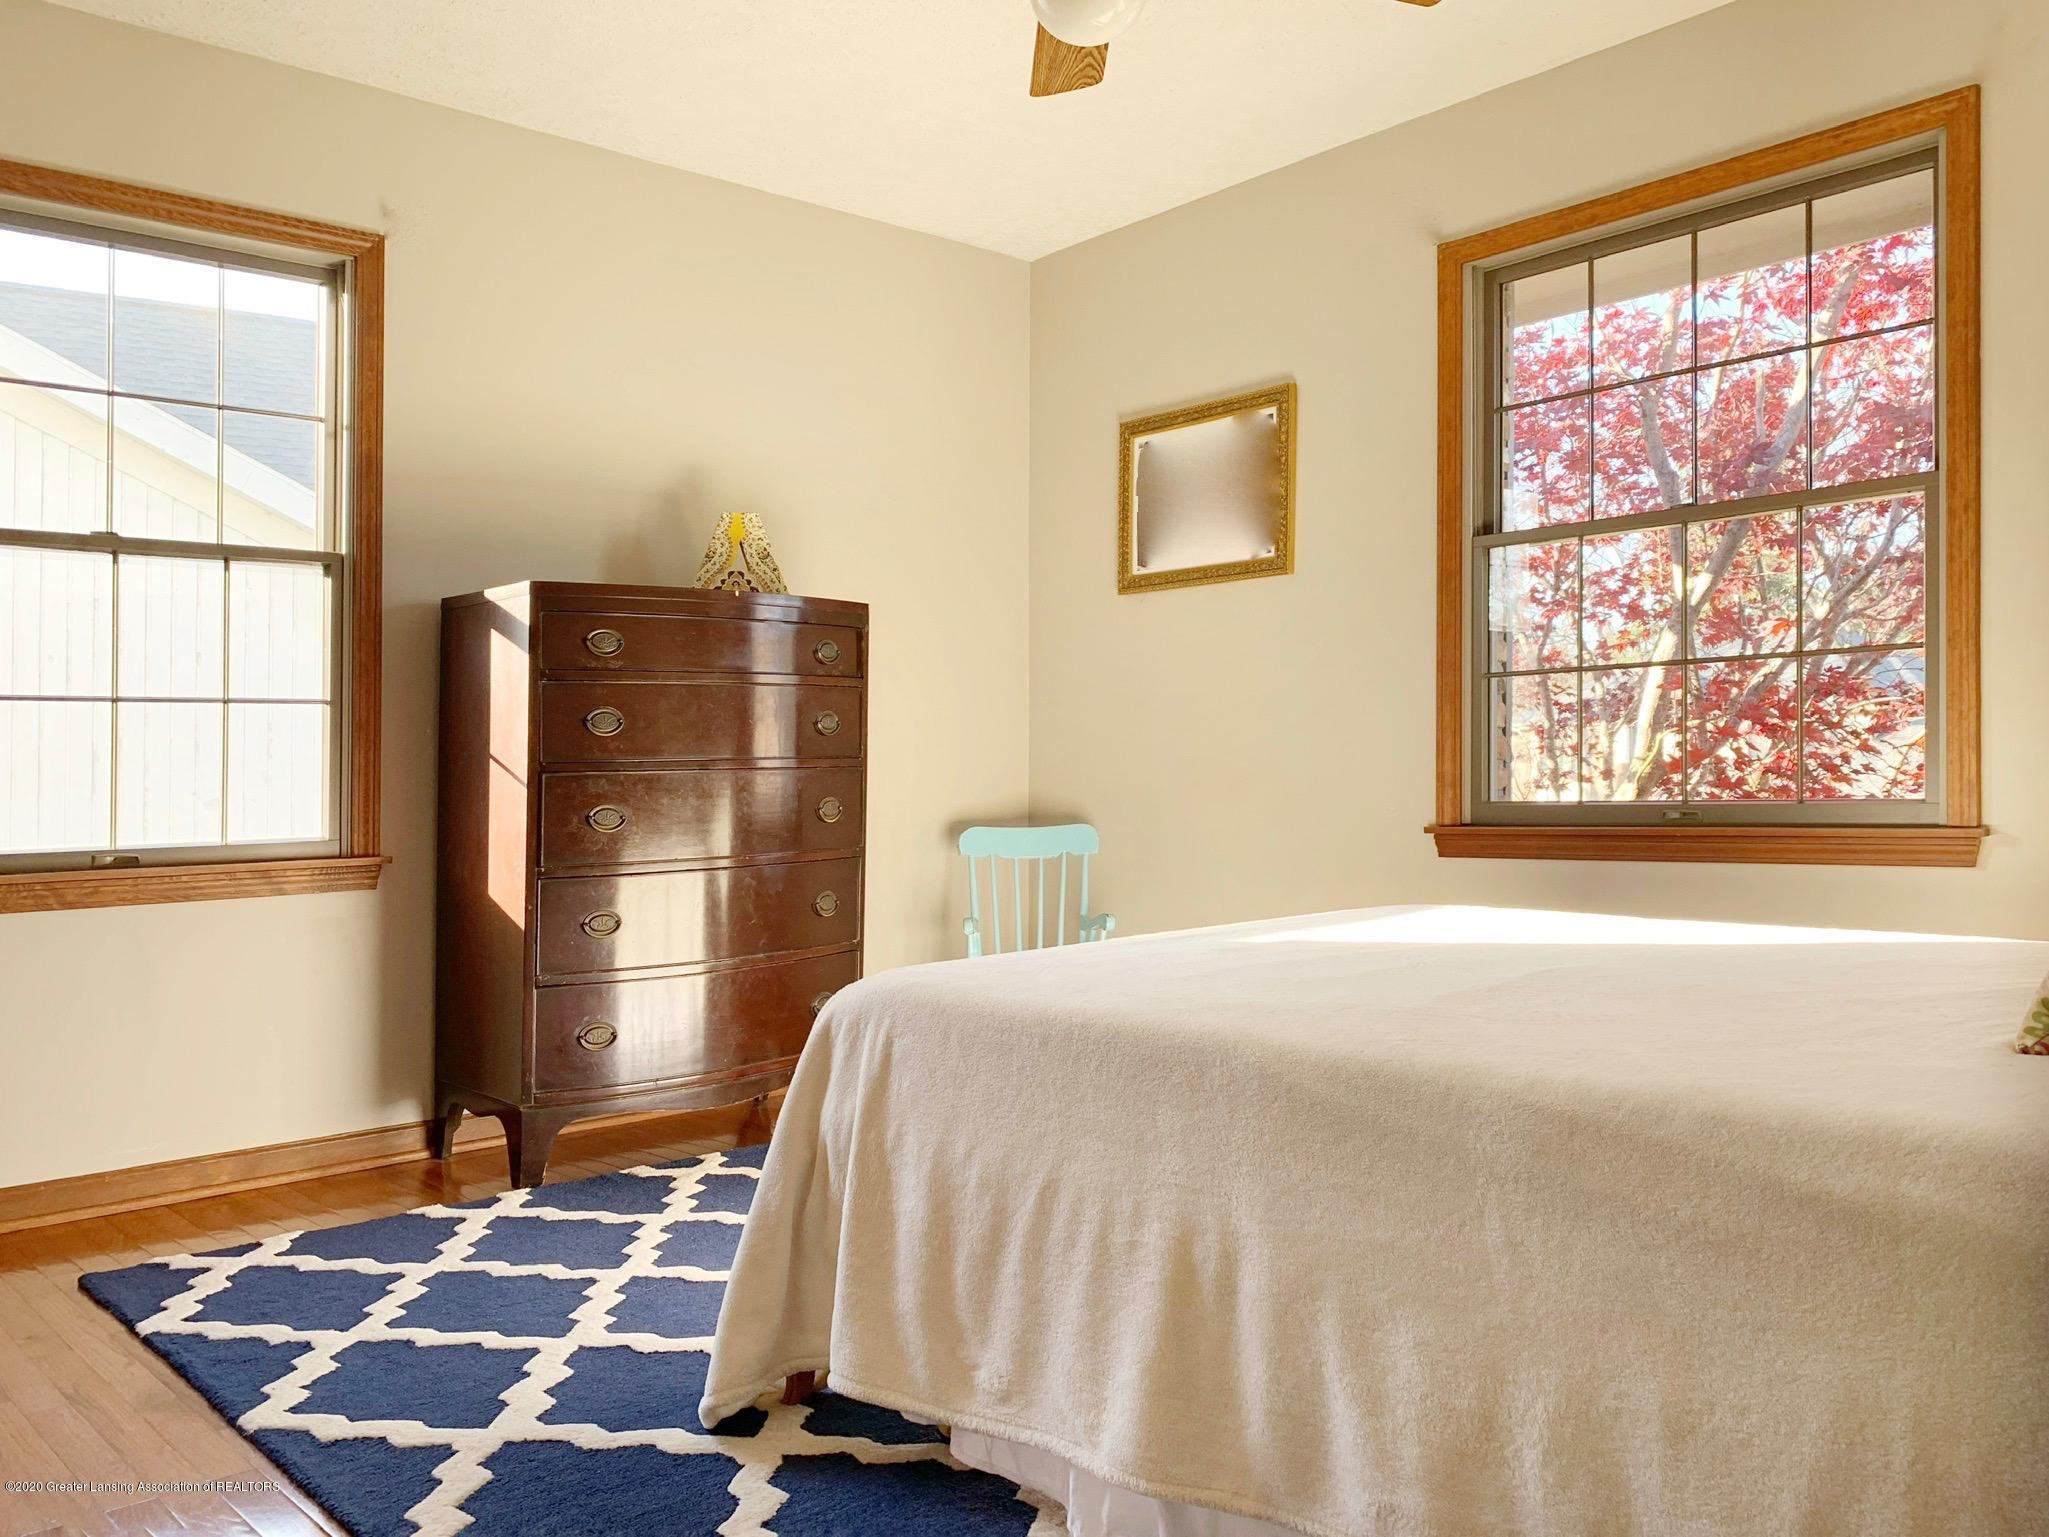 2139 Woodfield Rd - Bedroom - 17